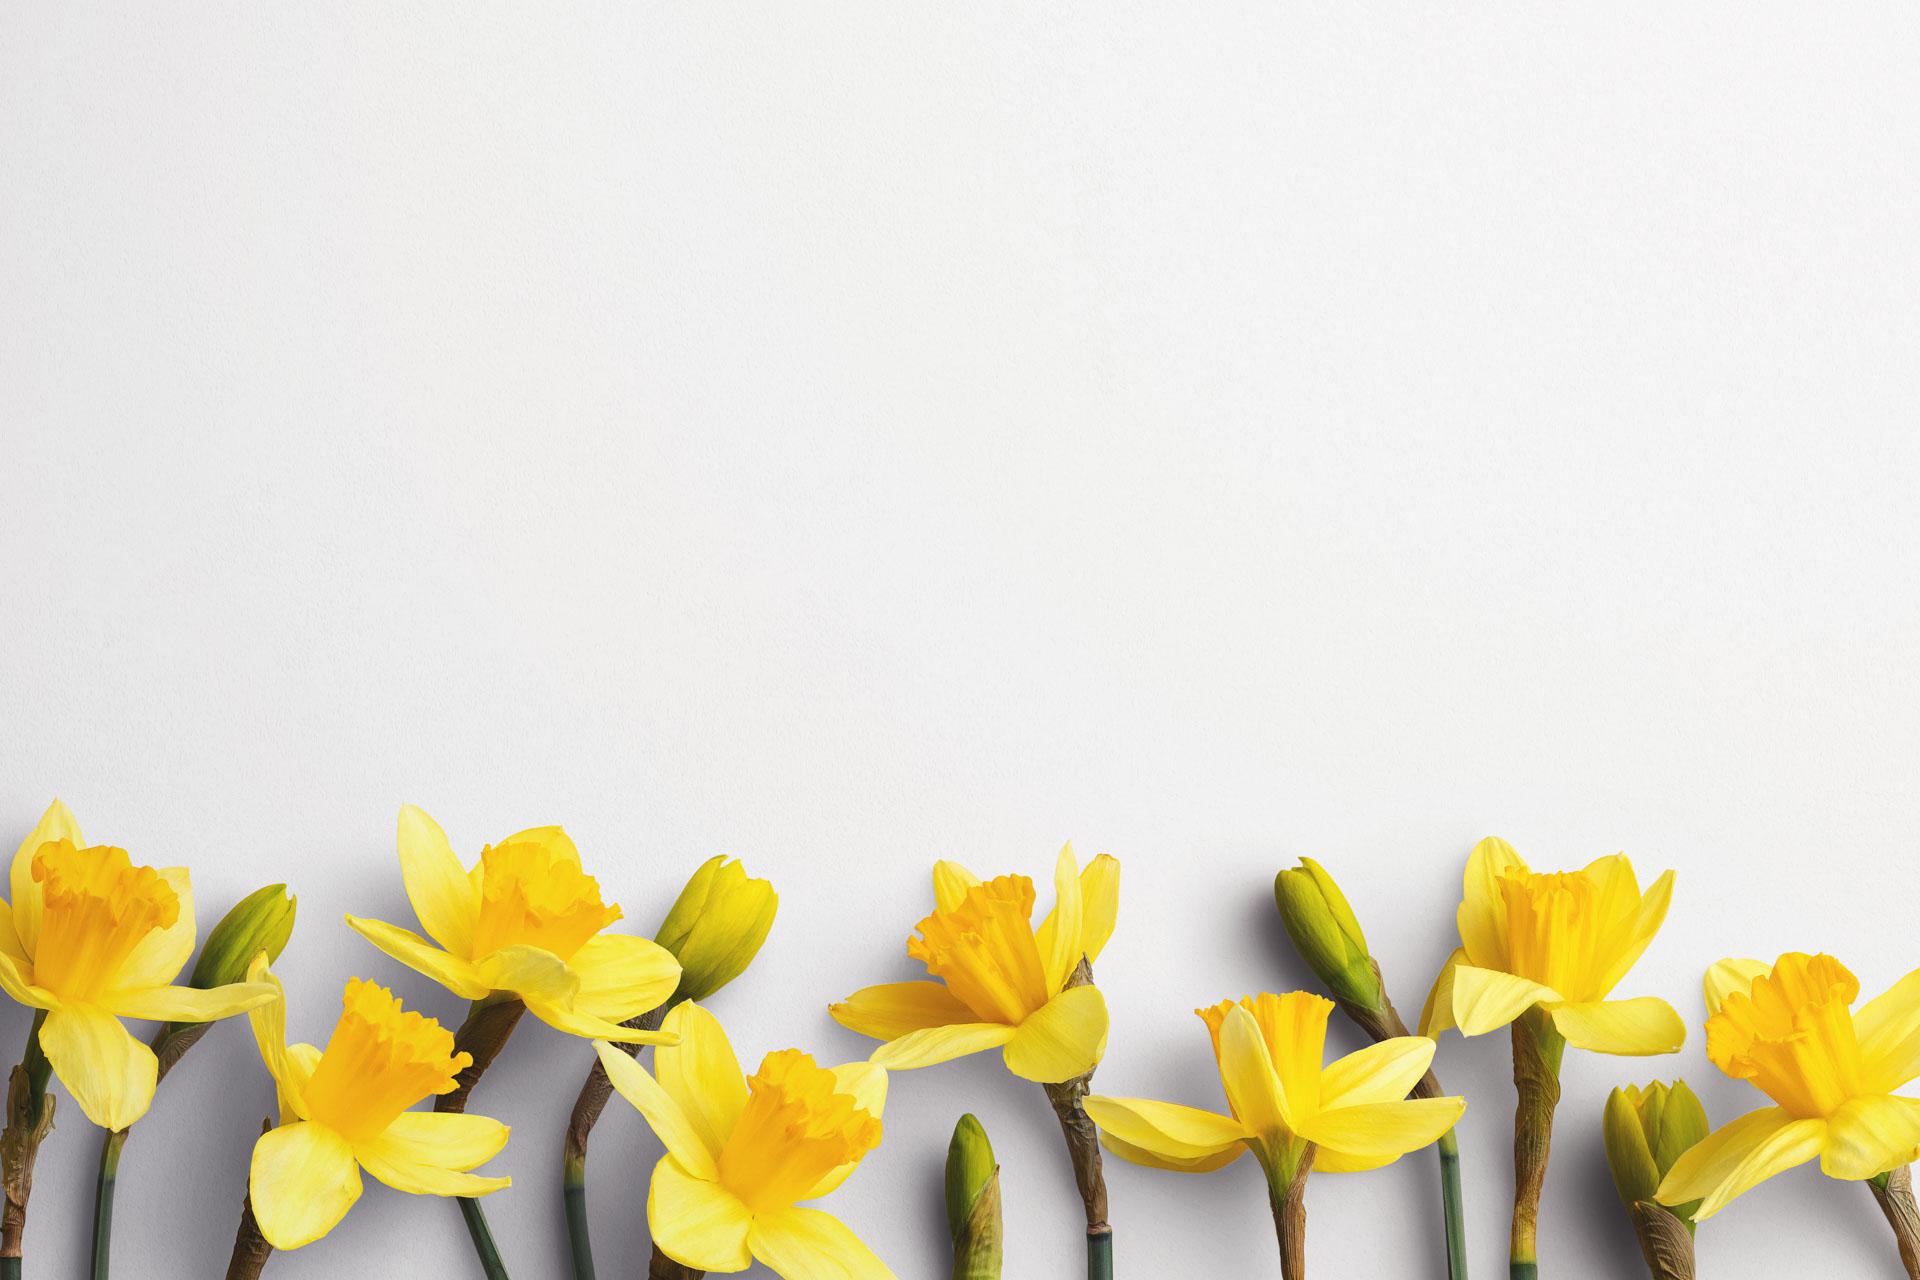 daffodils custom scene creator template 2 Thumbnail